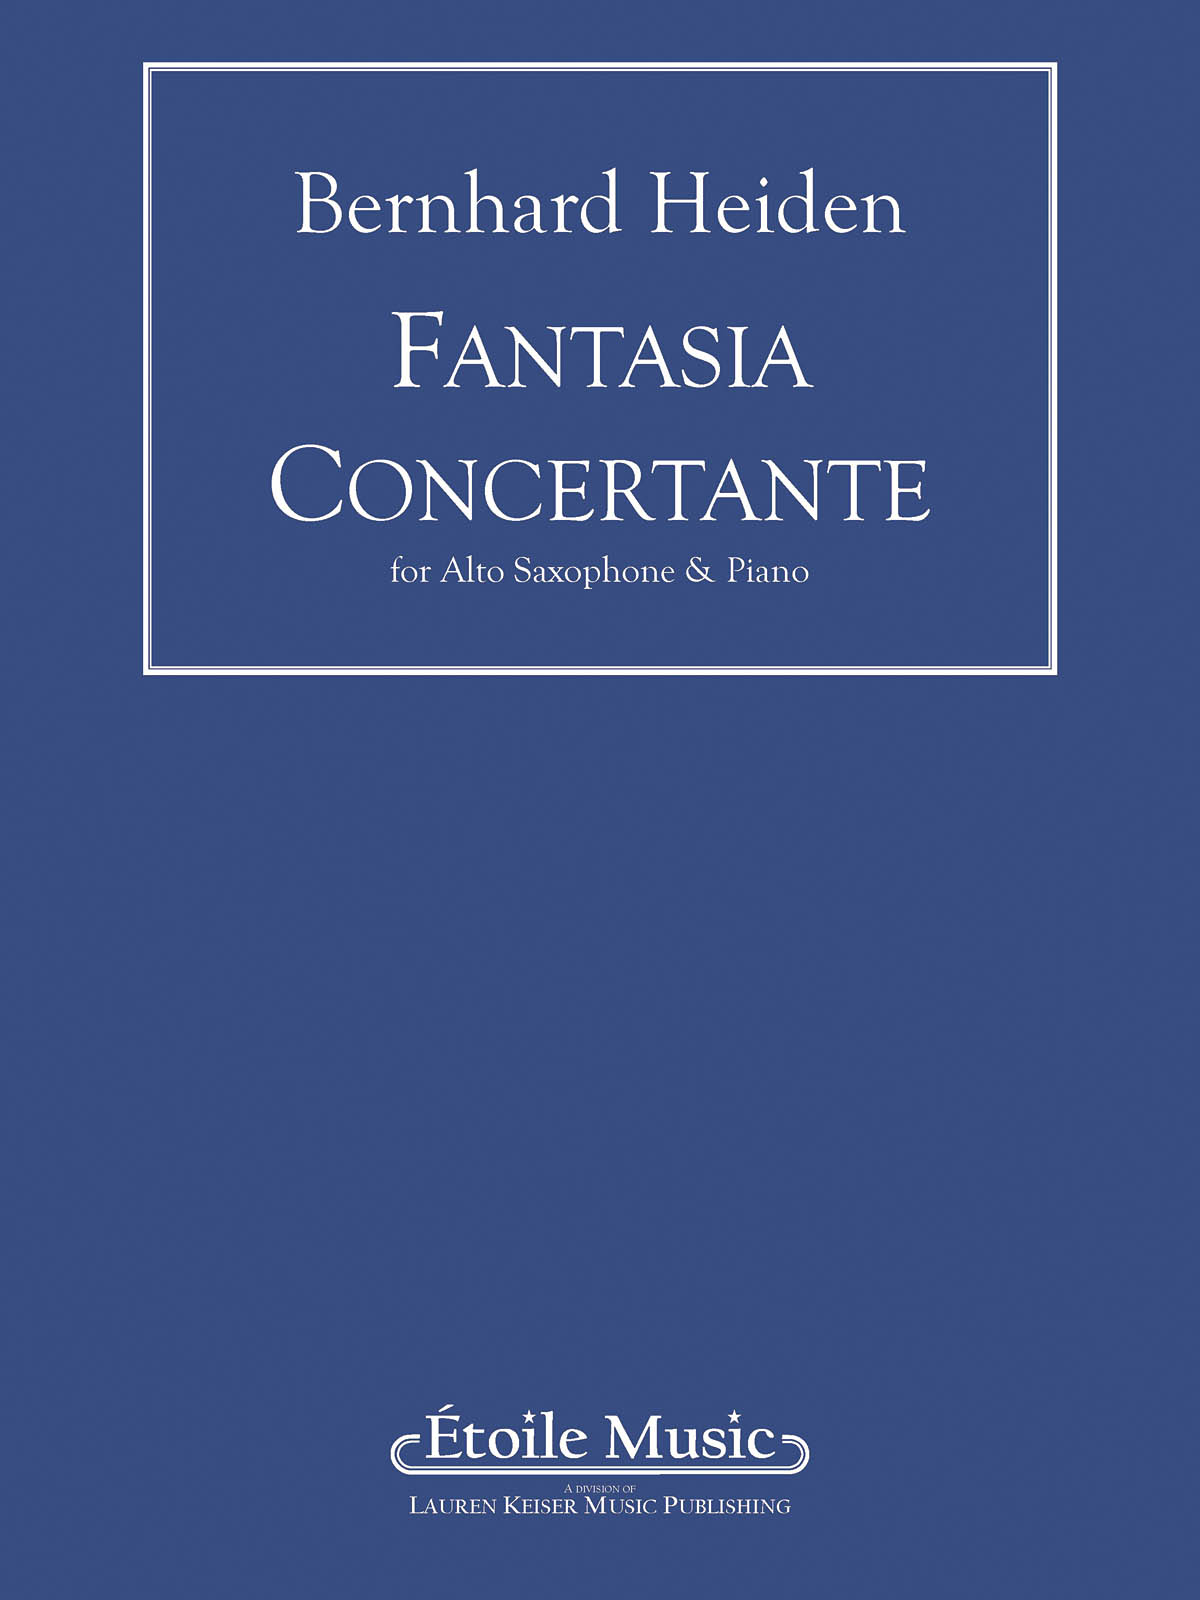 Bernhard Heiden: Fantasia Concertante (piano reduction): Alto Saxophone and